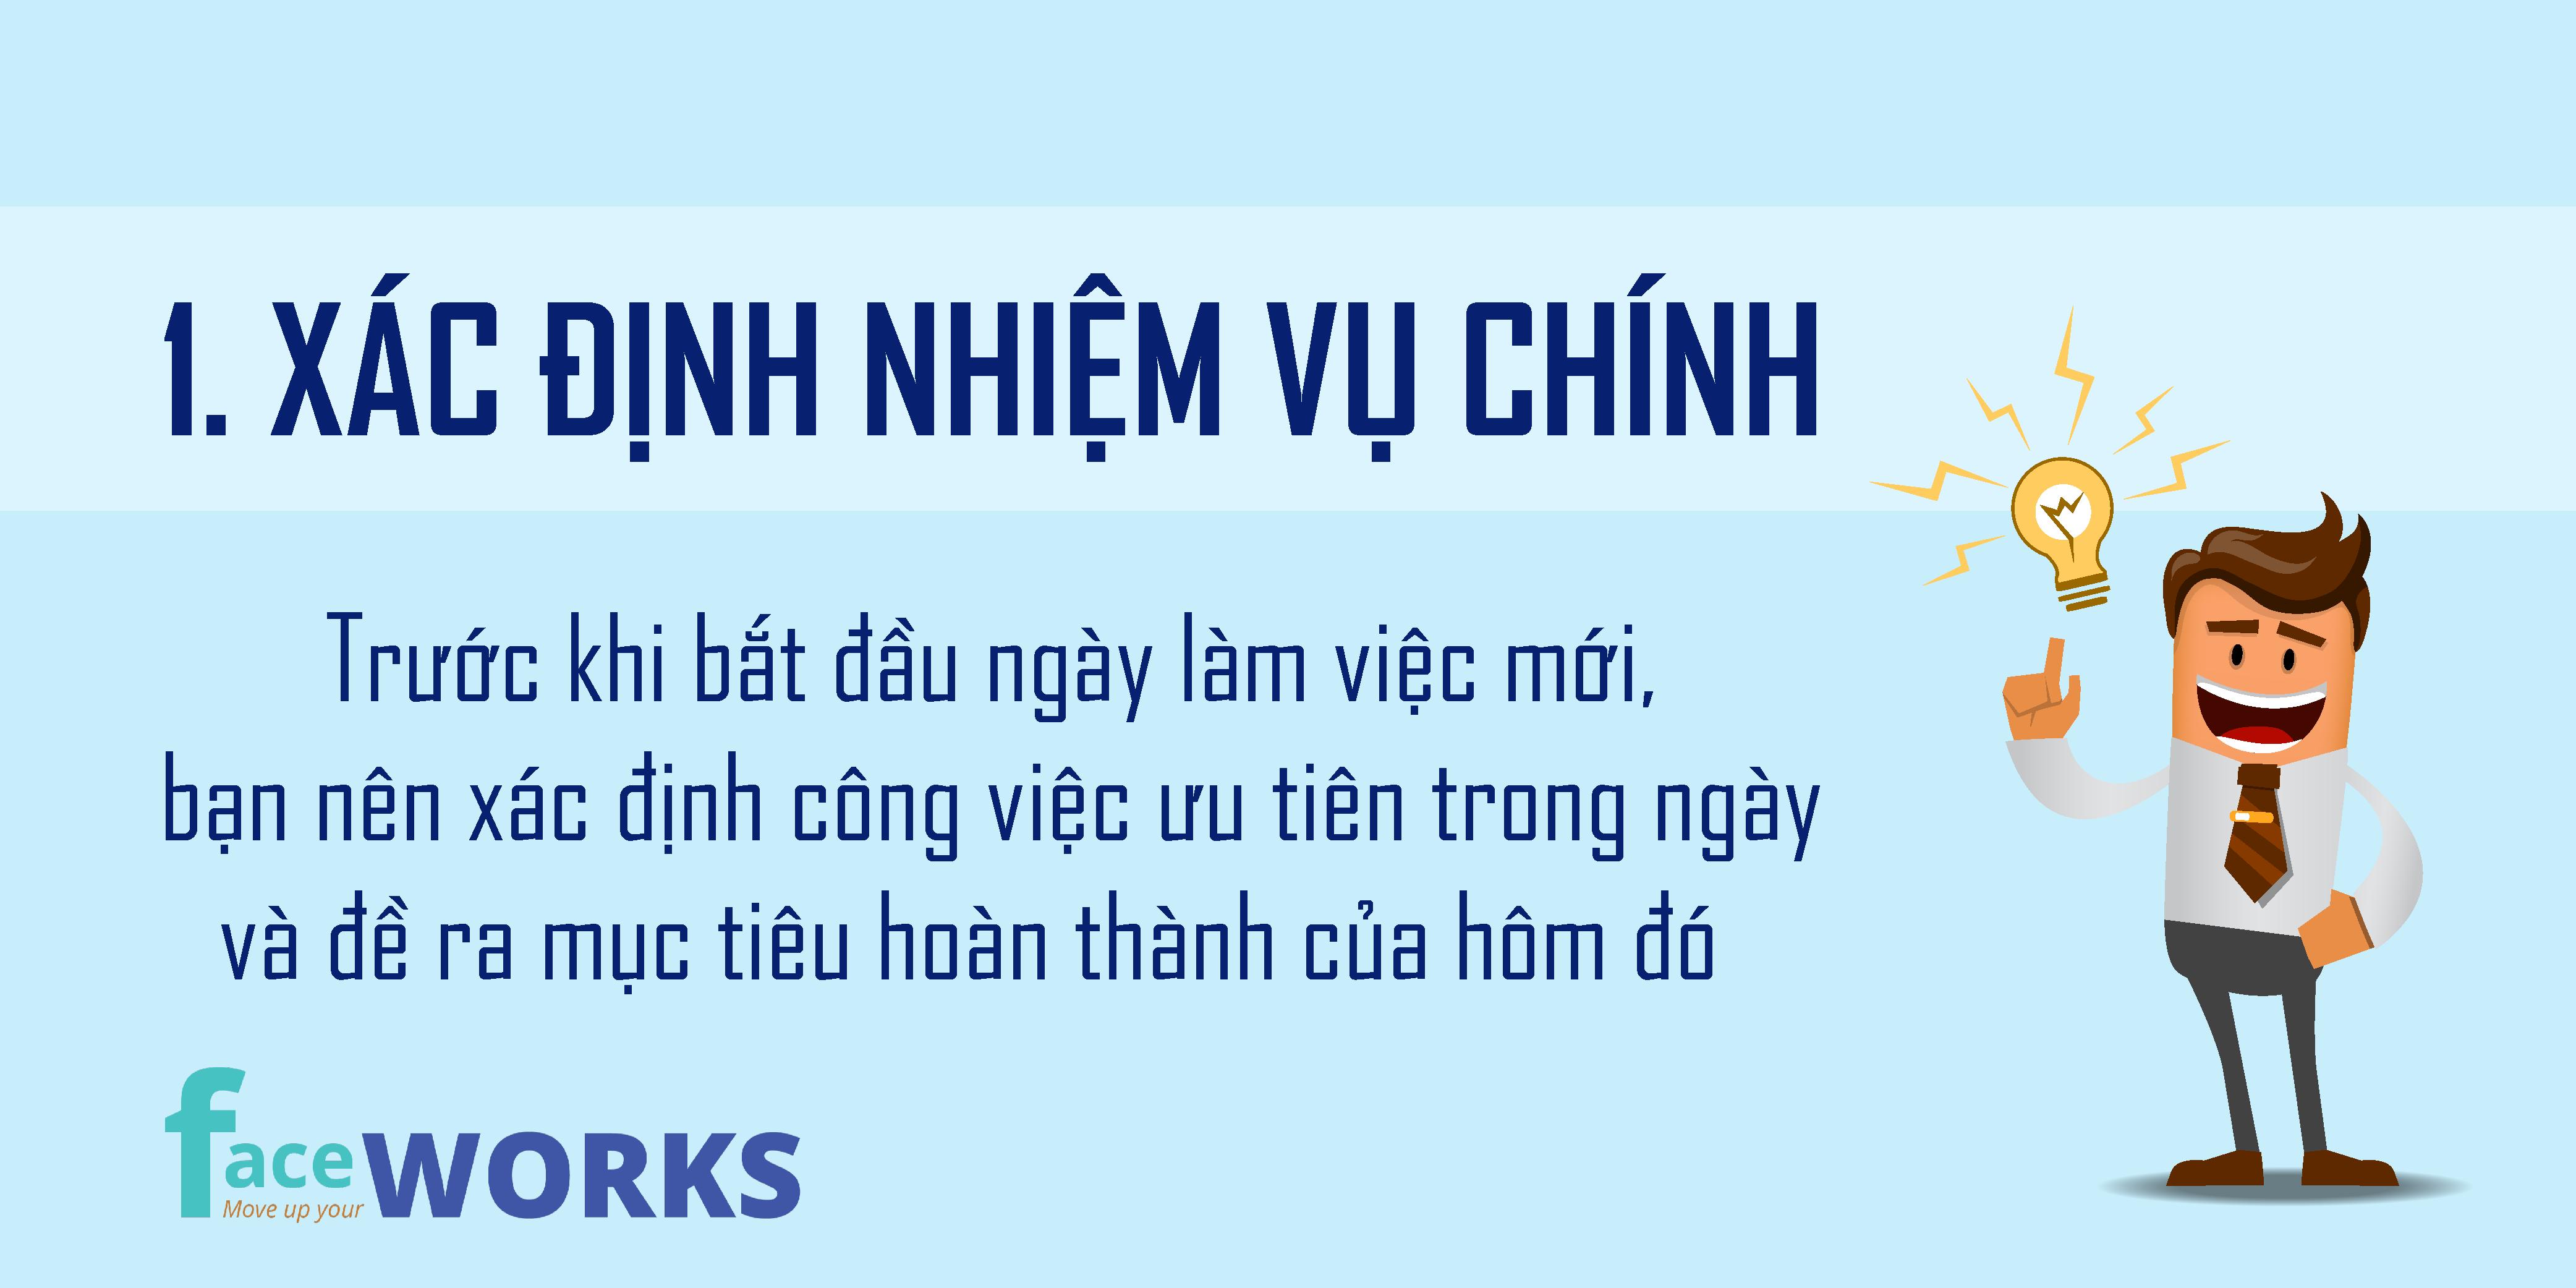 nang cao hieu suat lam viec co gi kho (1)